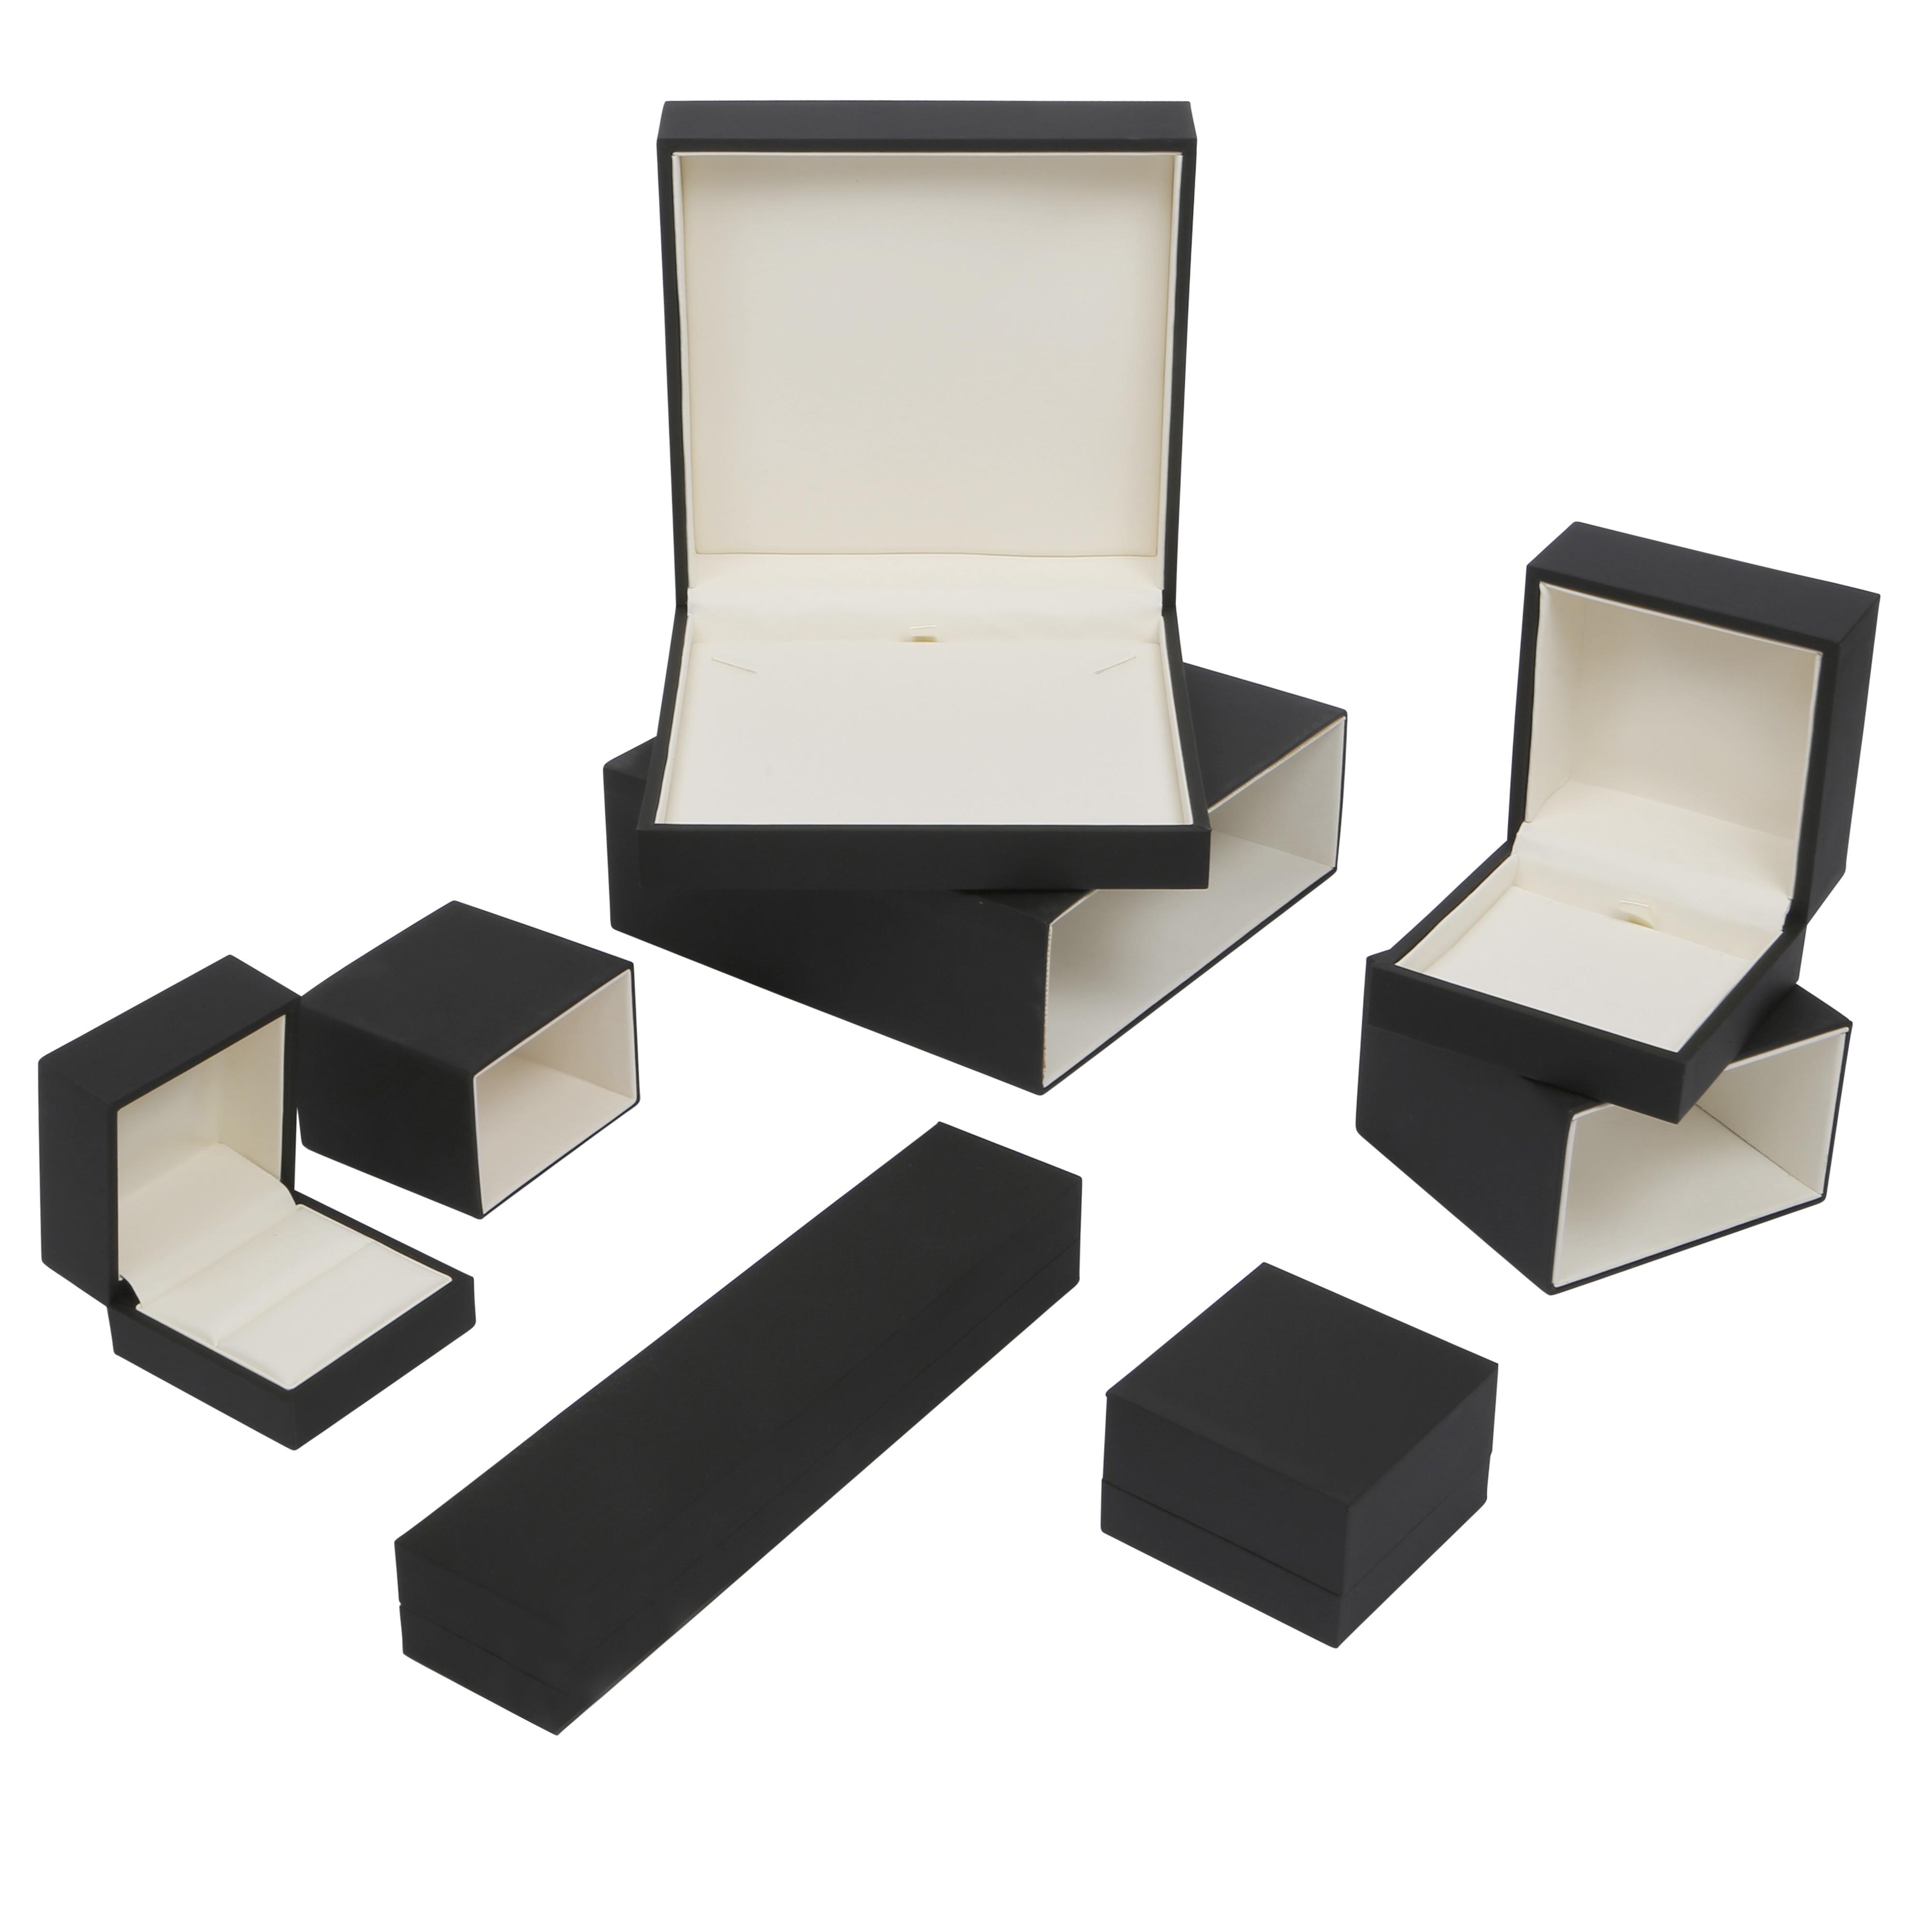 Boxes Types